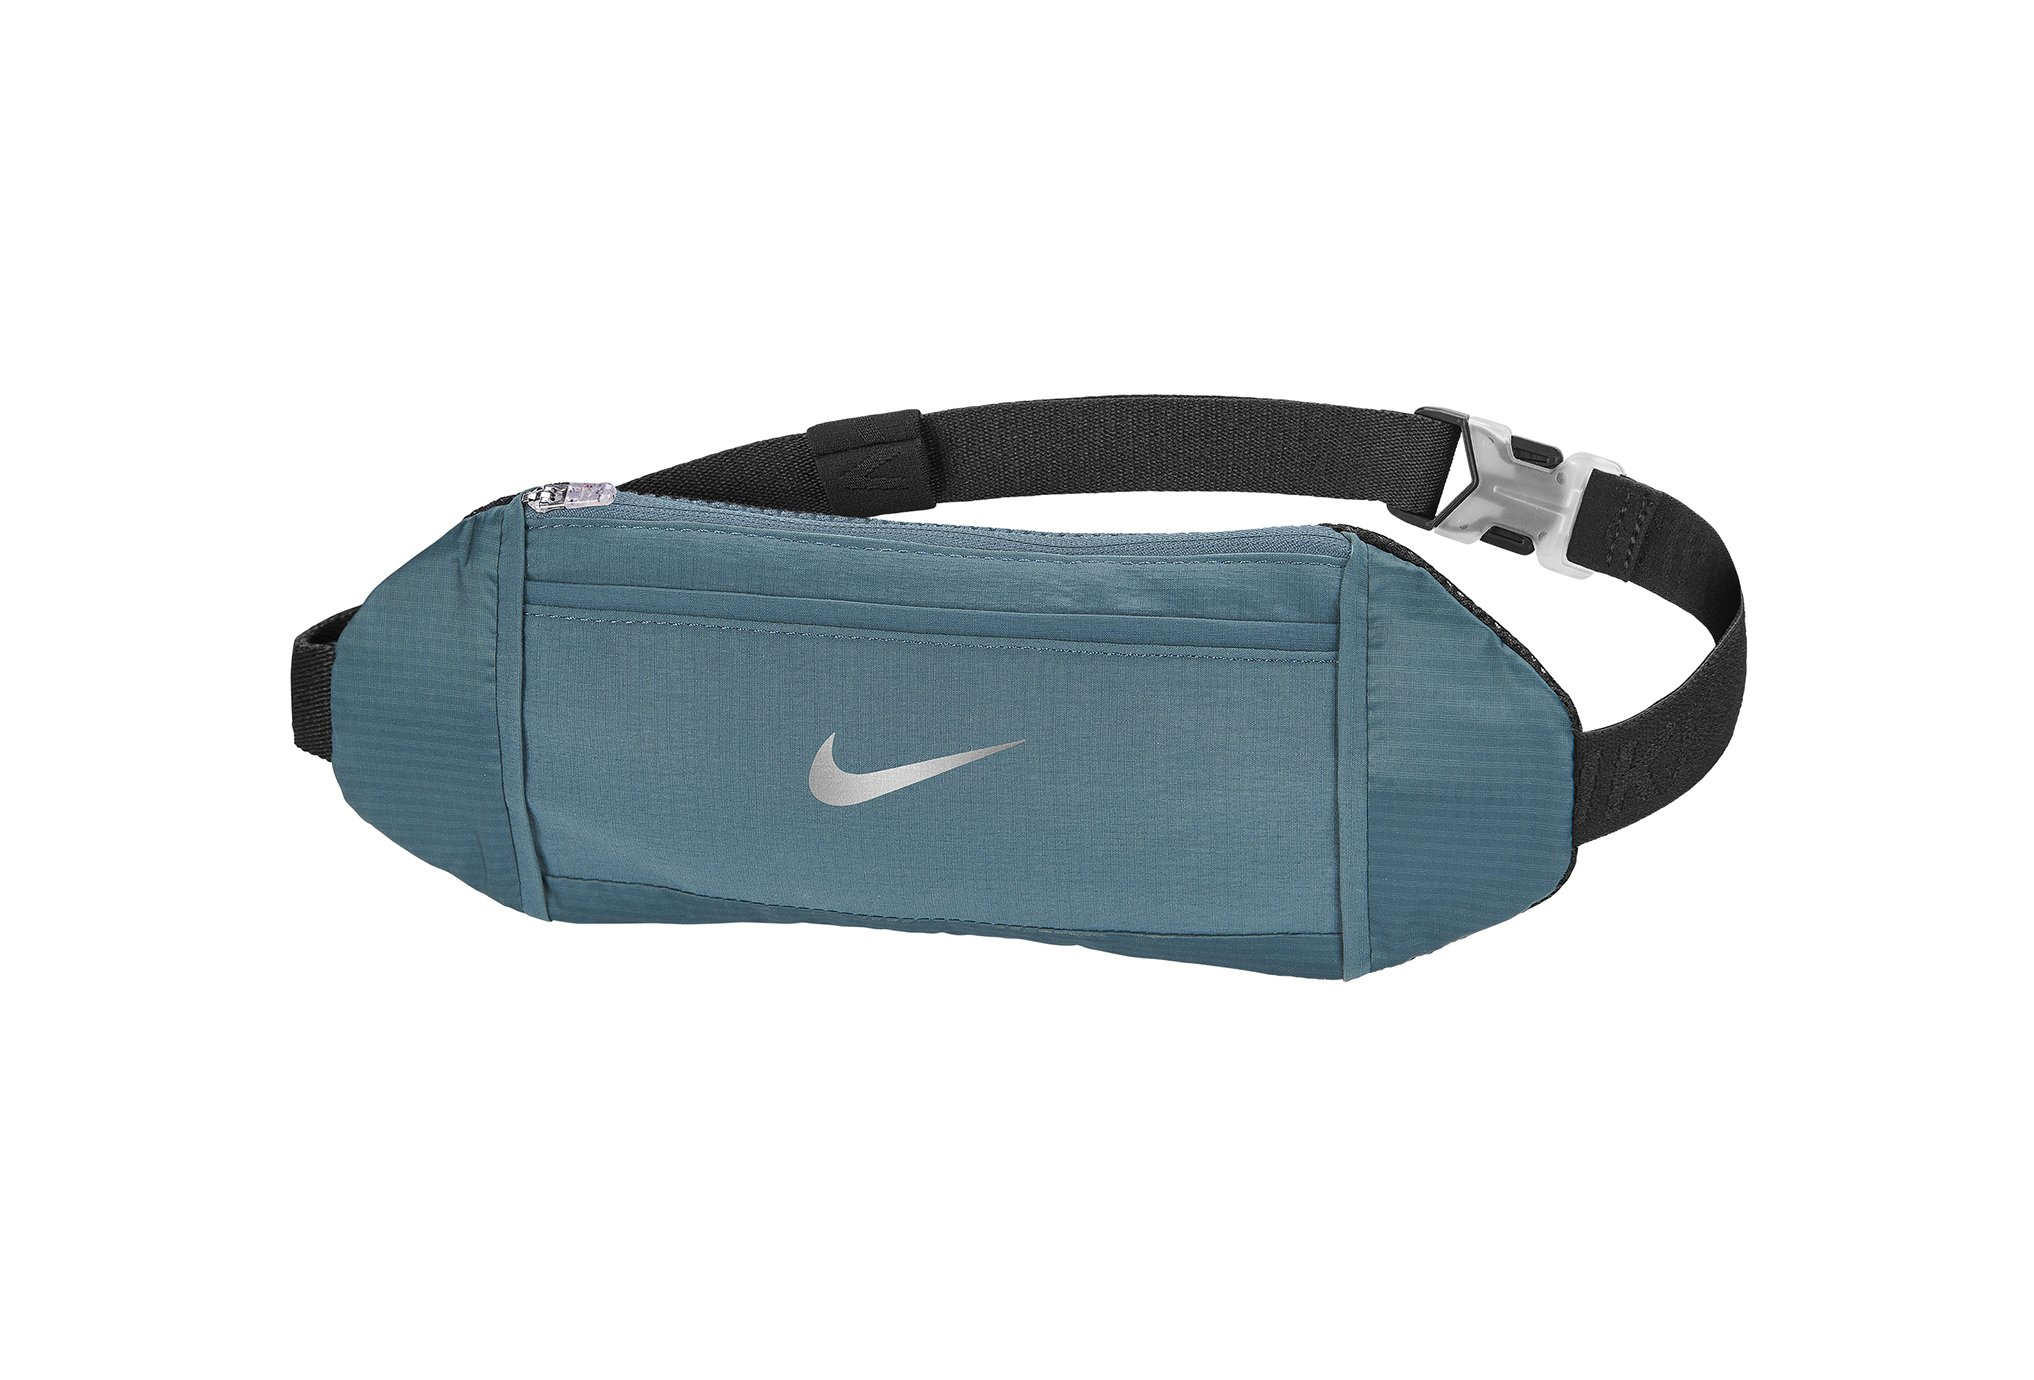 Nike Challenger Waistpack - Small Ceinture / porte dossard